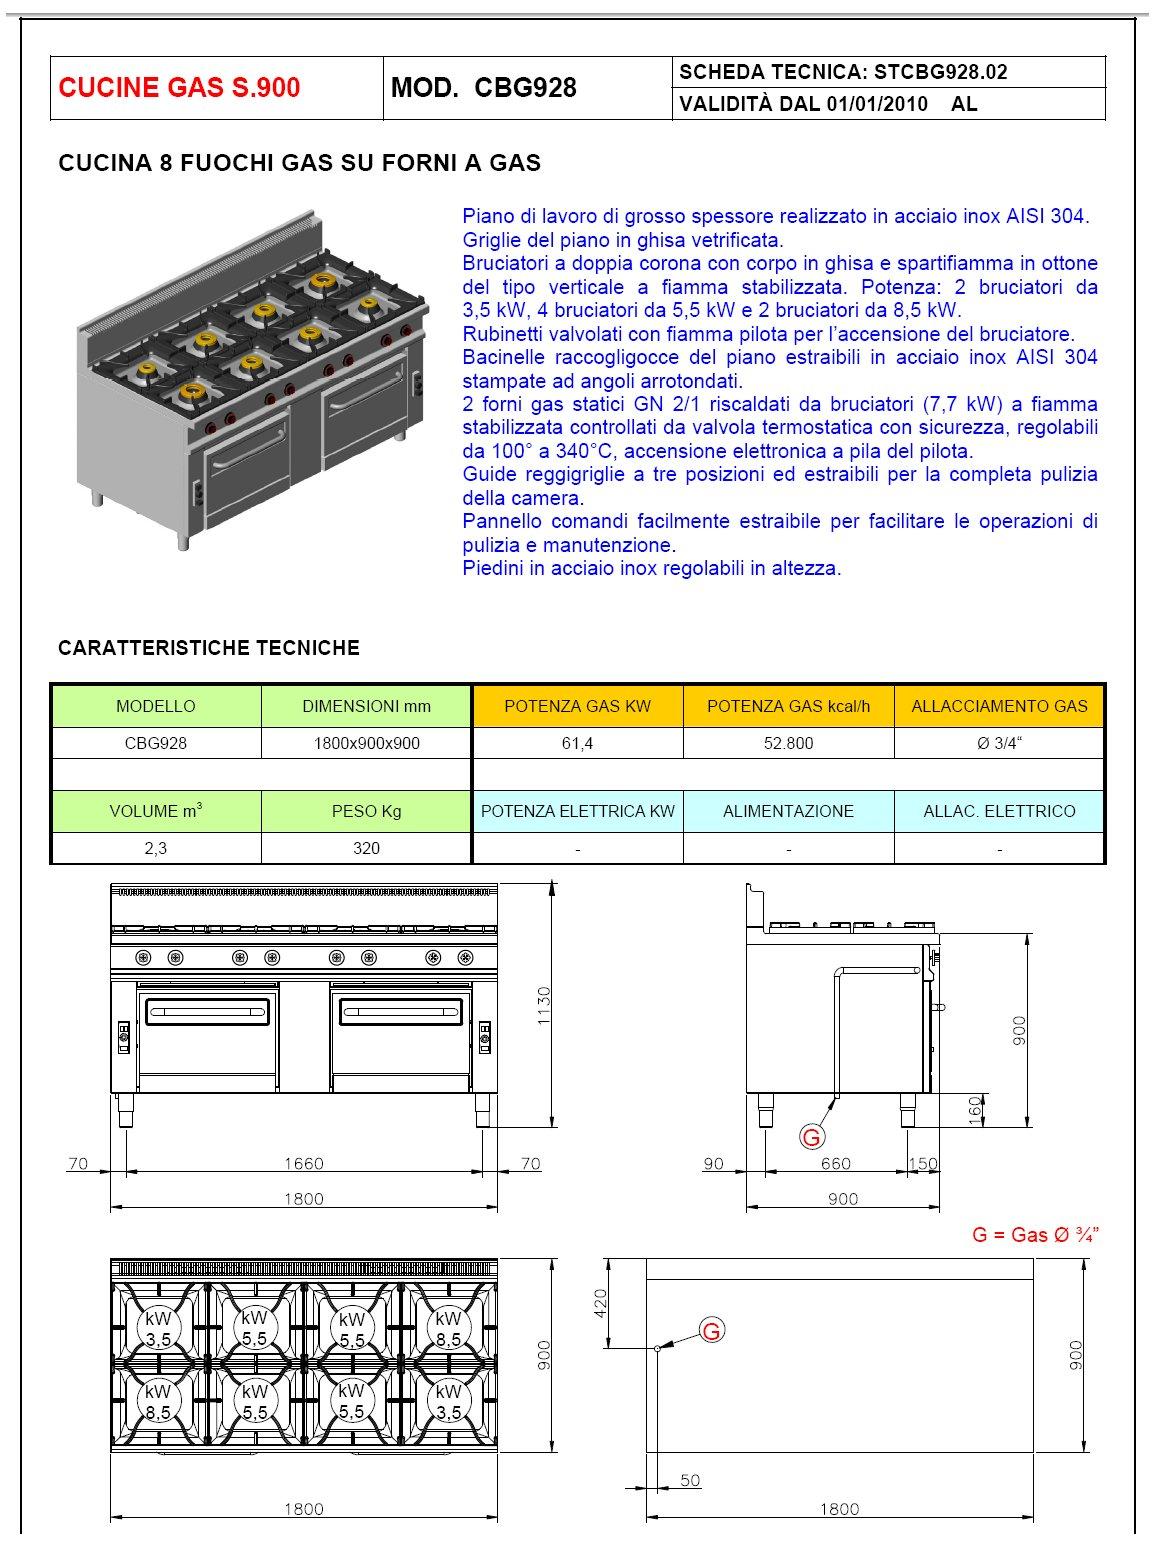 cucina a gas 8 fuochi con 2 forni offcar serie 990 9cbg28. Black Bedroom Furniture Sets. Home Design Ideas